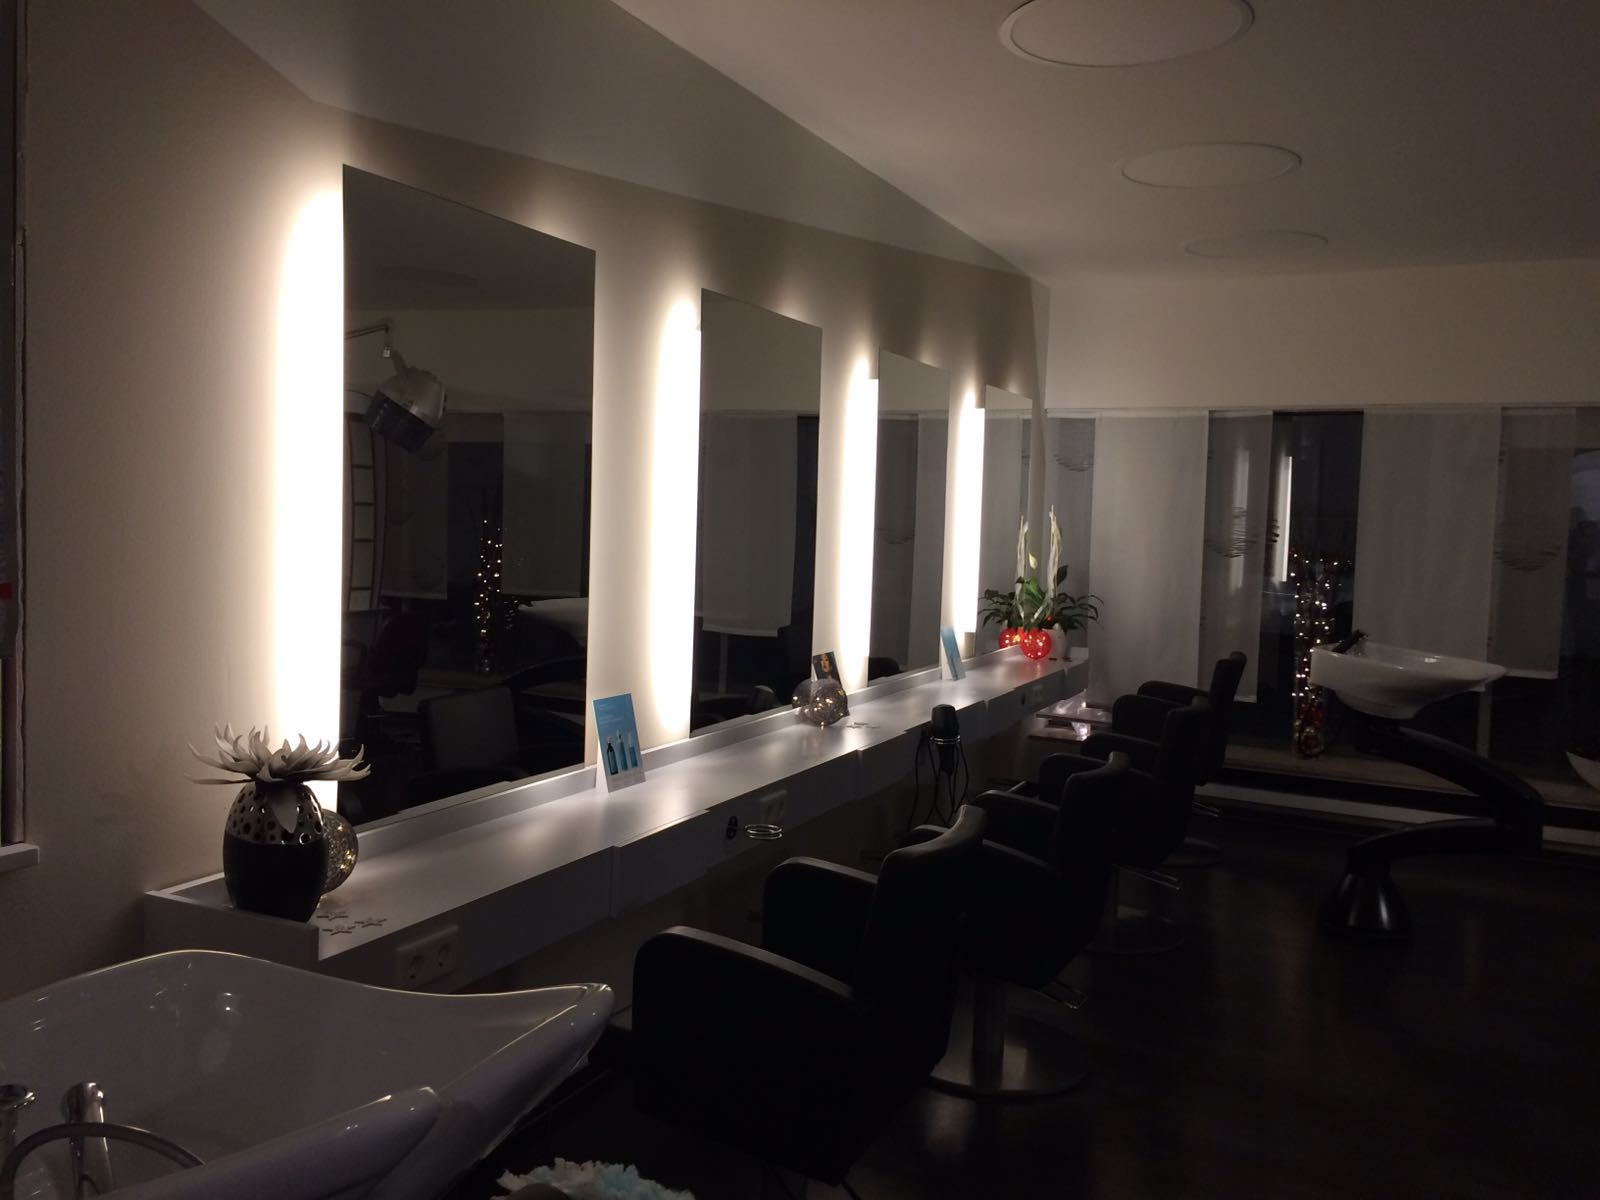 Salon Melissa - Höchstädt a.d. Donau